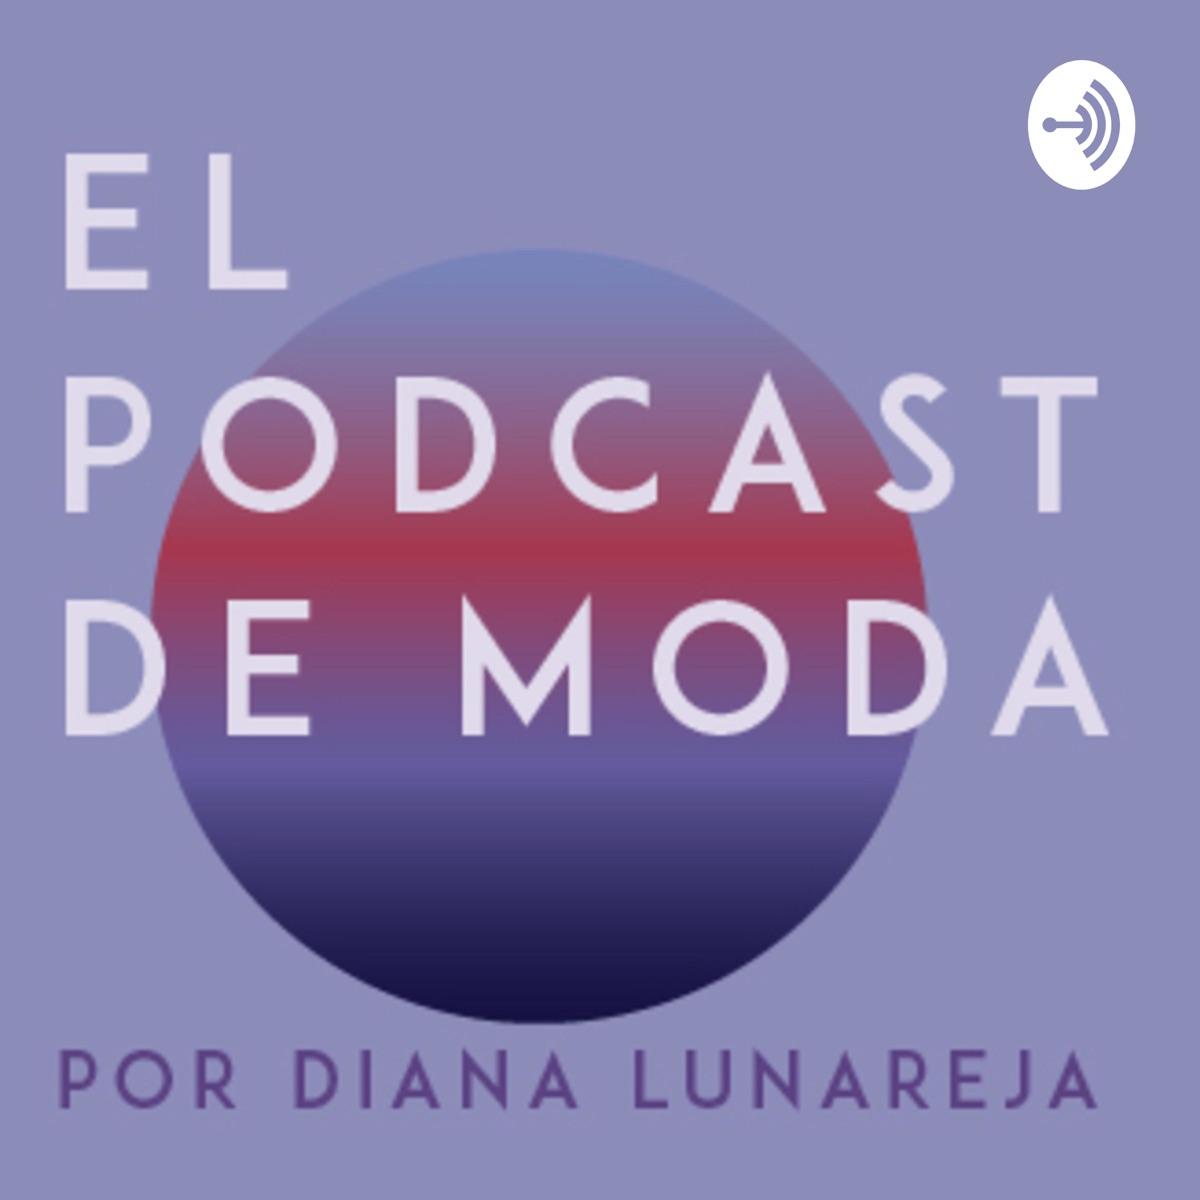 El Podcast de Moda